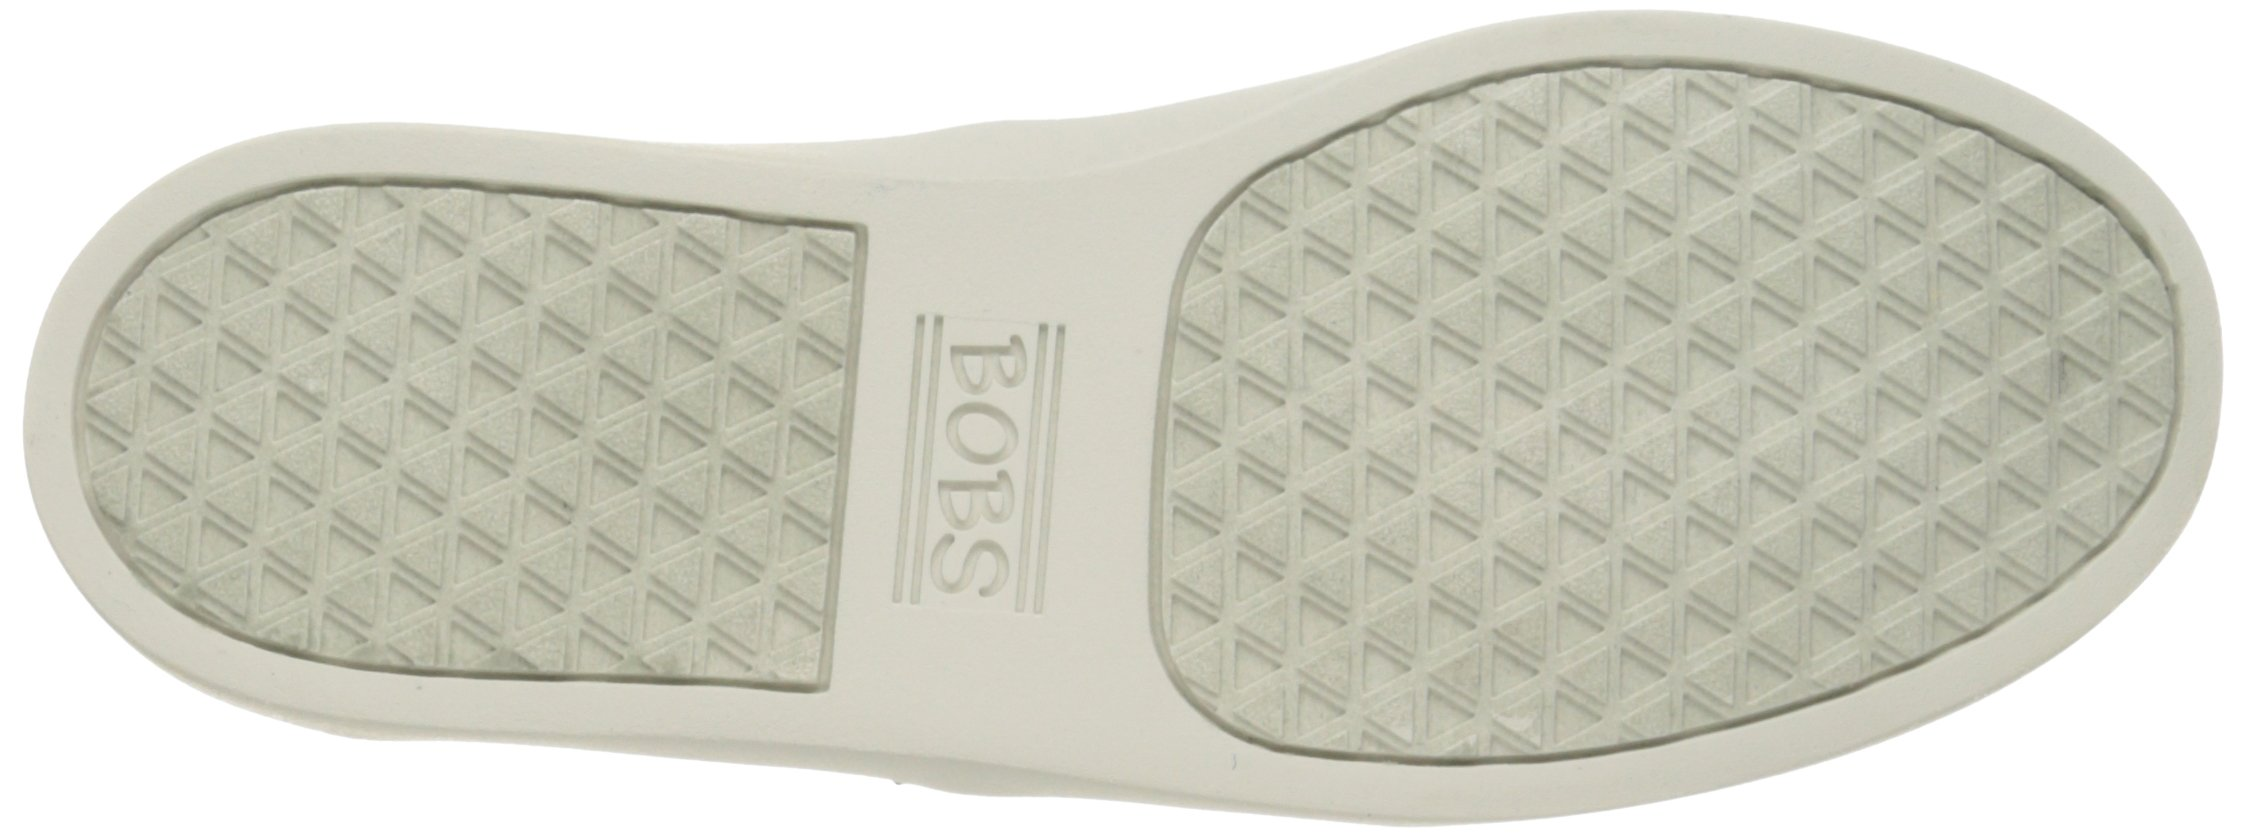 Skechers BOBS Women's Bobs-b Love Flat, Charcoal, 5.5 M US by Skechers (Image #3)